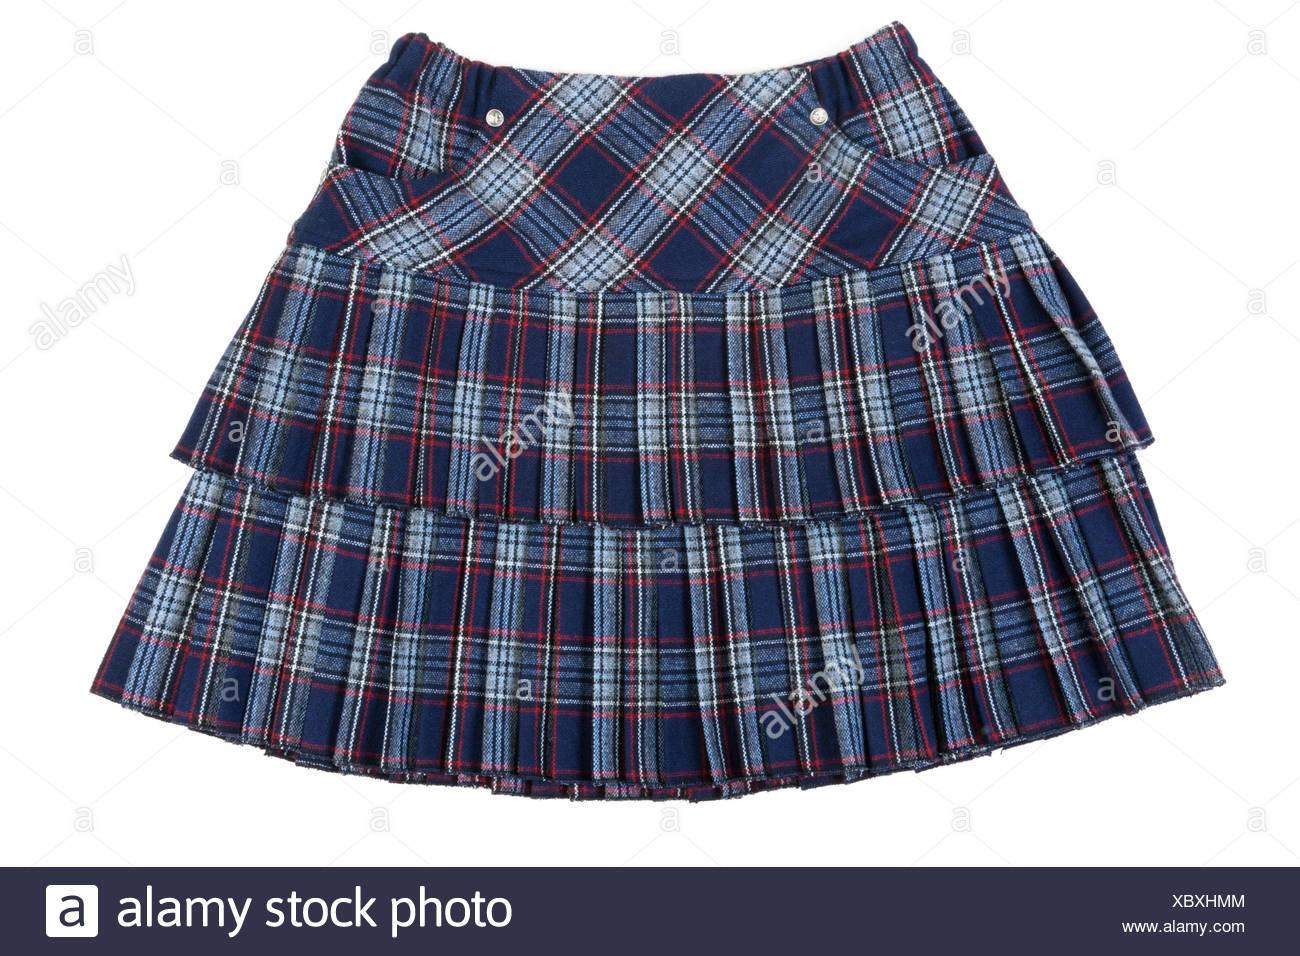 skirt, blue, single, isolated, fashion, small, tiny, little, short, mini, one, - Stock Image